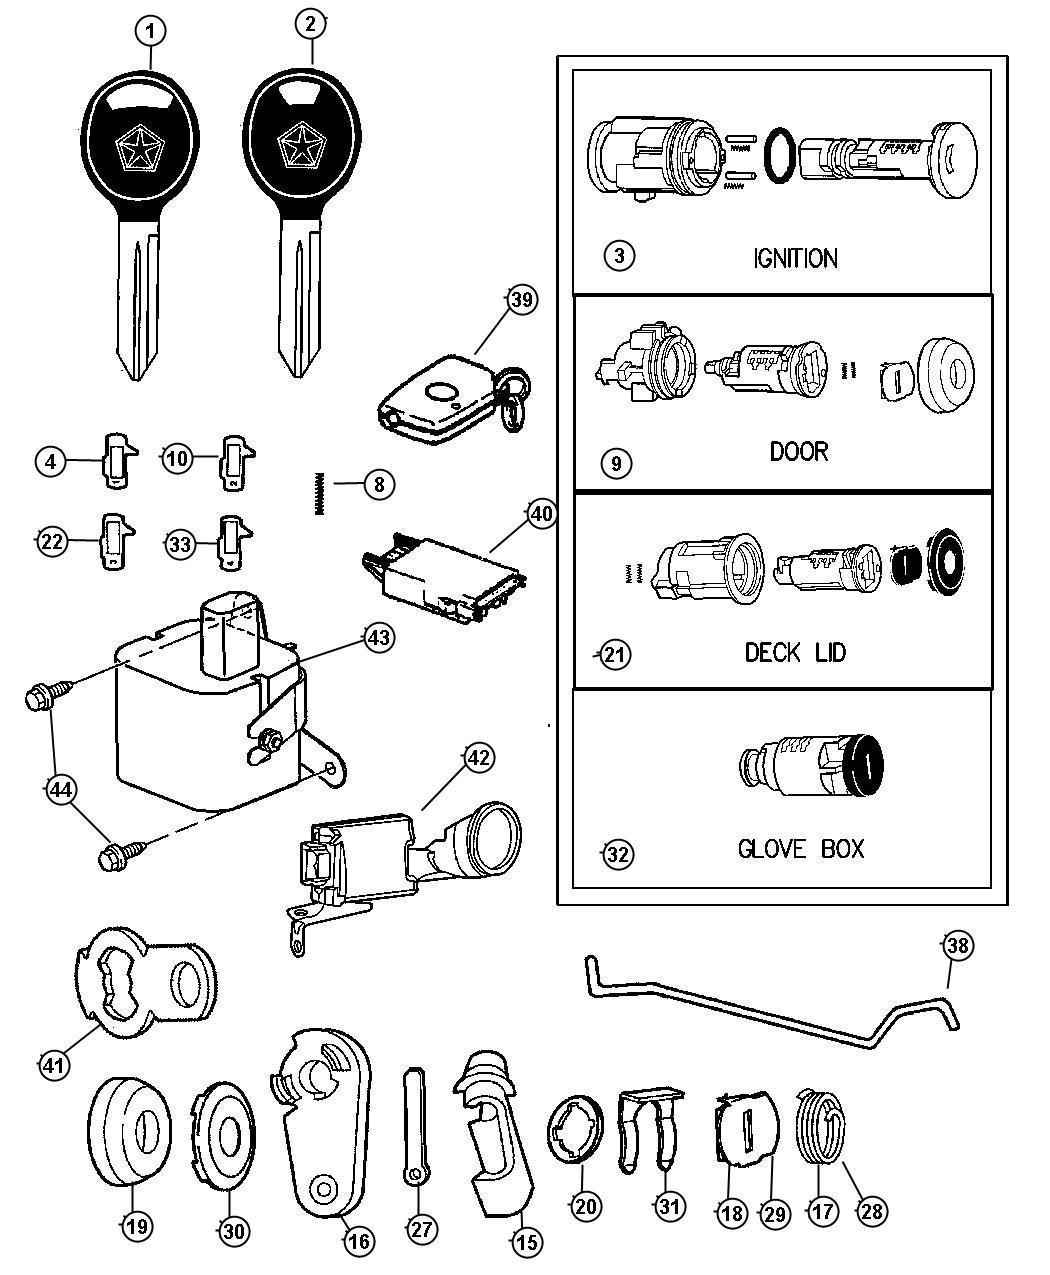 diagram further scag turf tiger drive belt diagram on scag mower diagram kohler image about wiring diagram schematic diagram